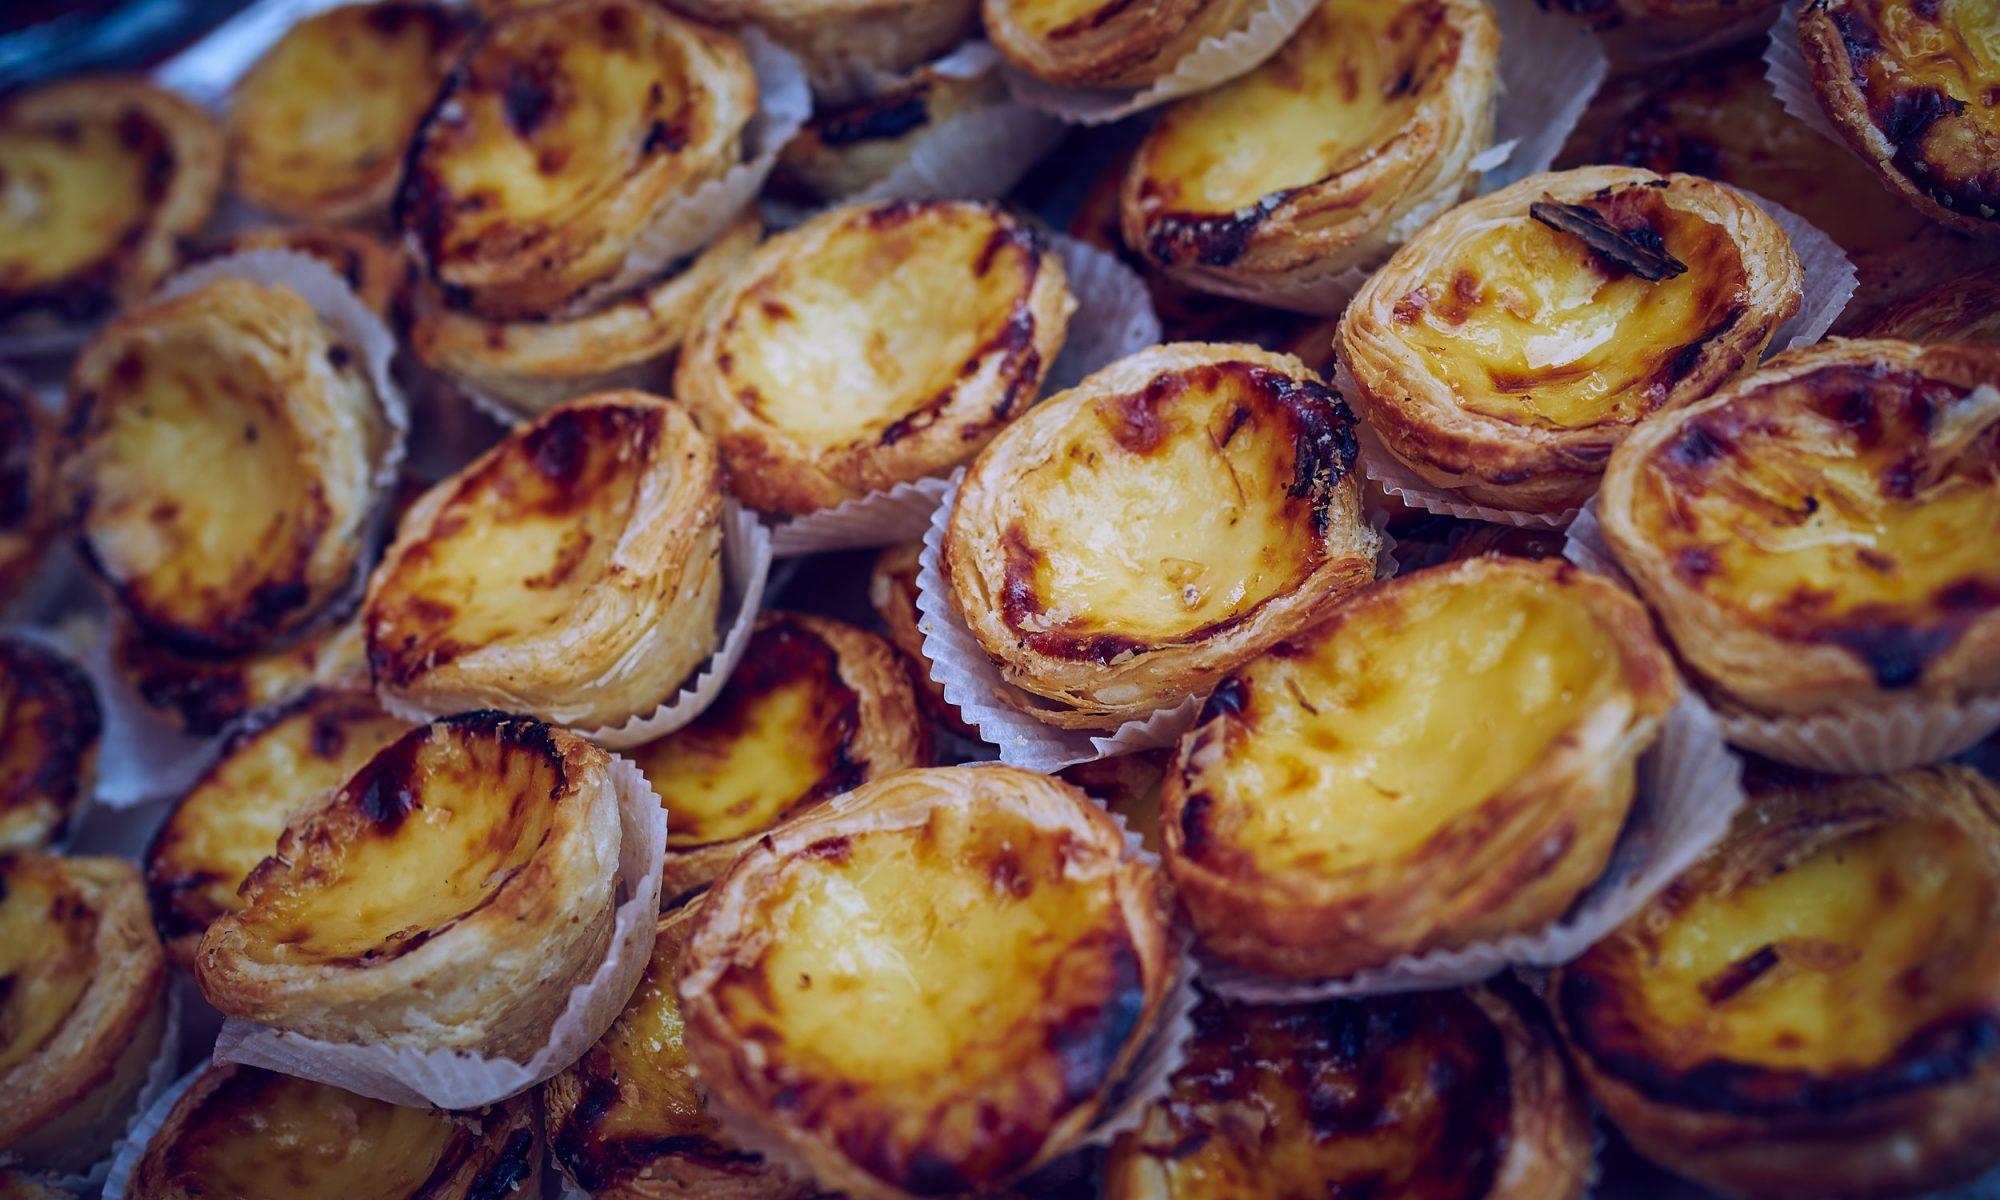 EC: Pastel de Nata Is So Much More Than an Egg Custard Tart